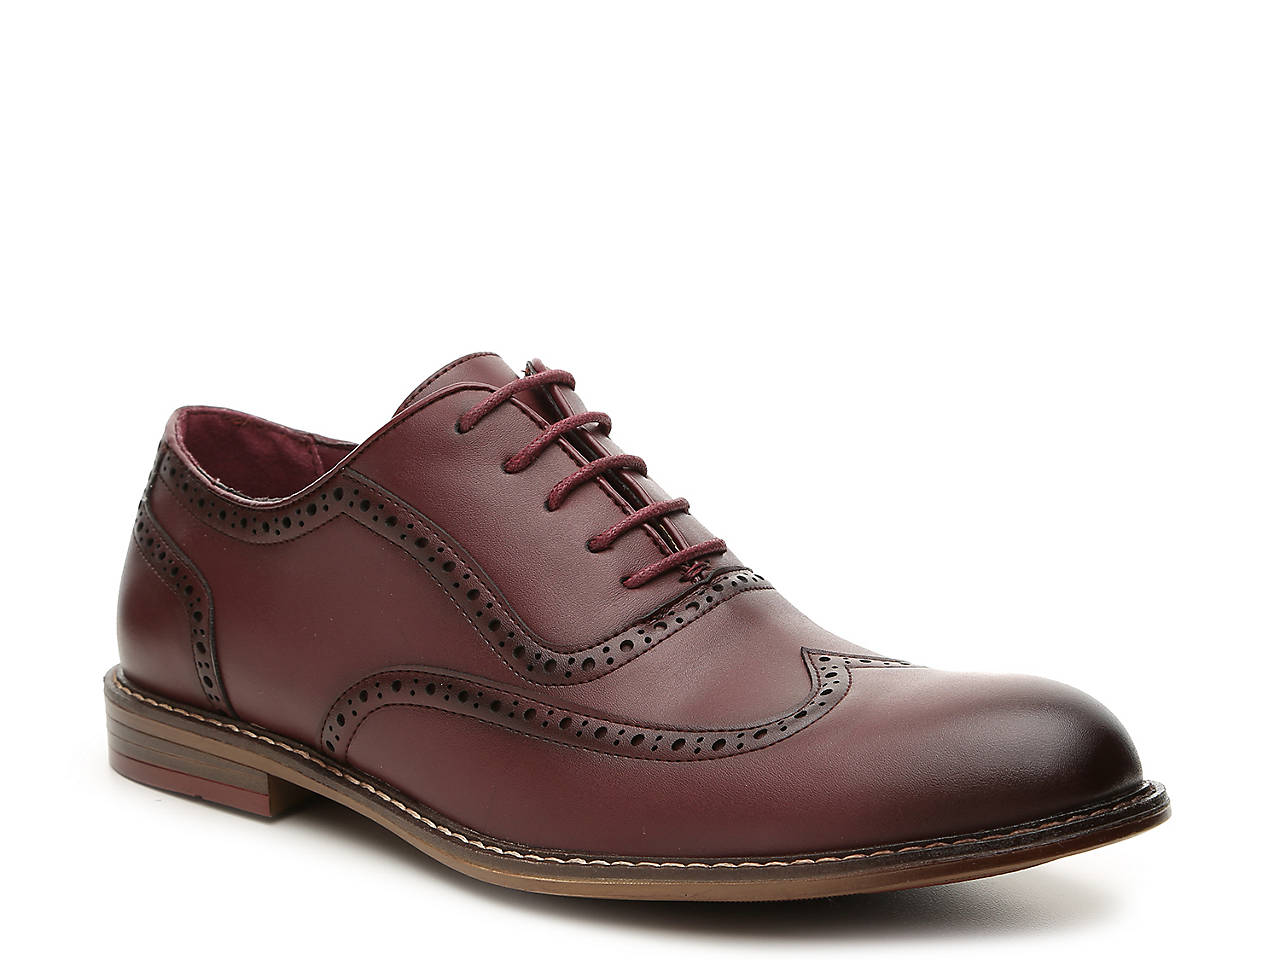 cheap price wiki cheap online Xray Cabaletta Men's Wingtip ... Dress Shoes cheap online store 01vvFNcCE